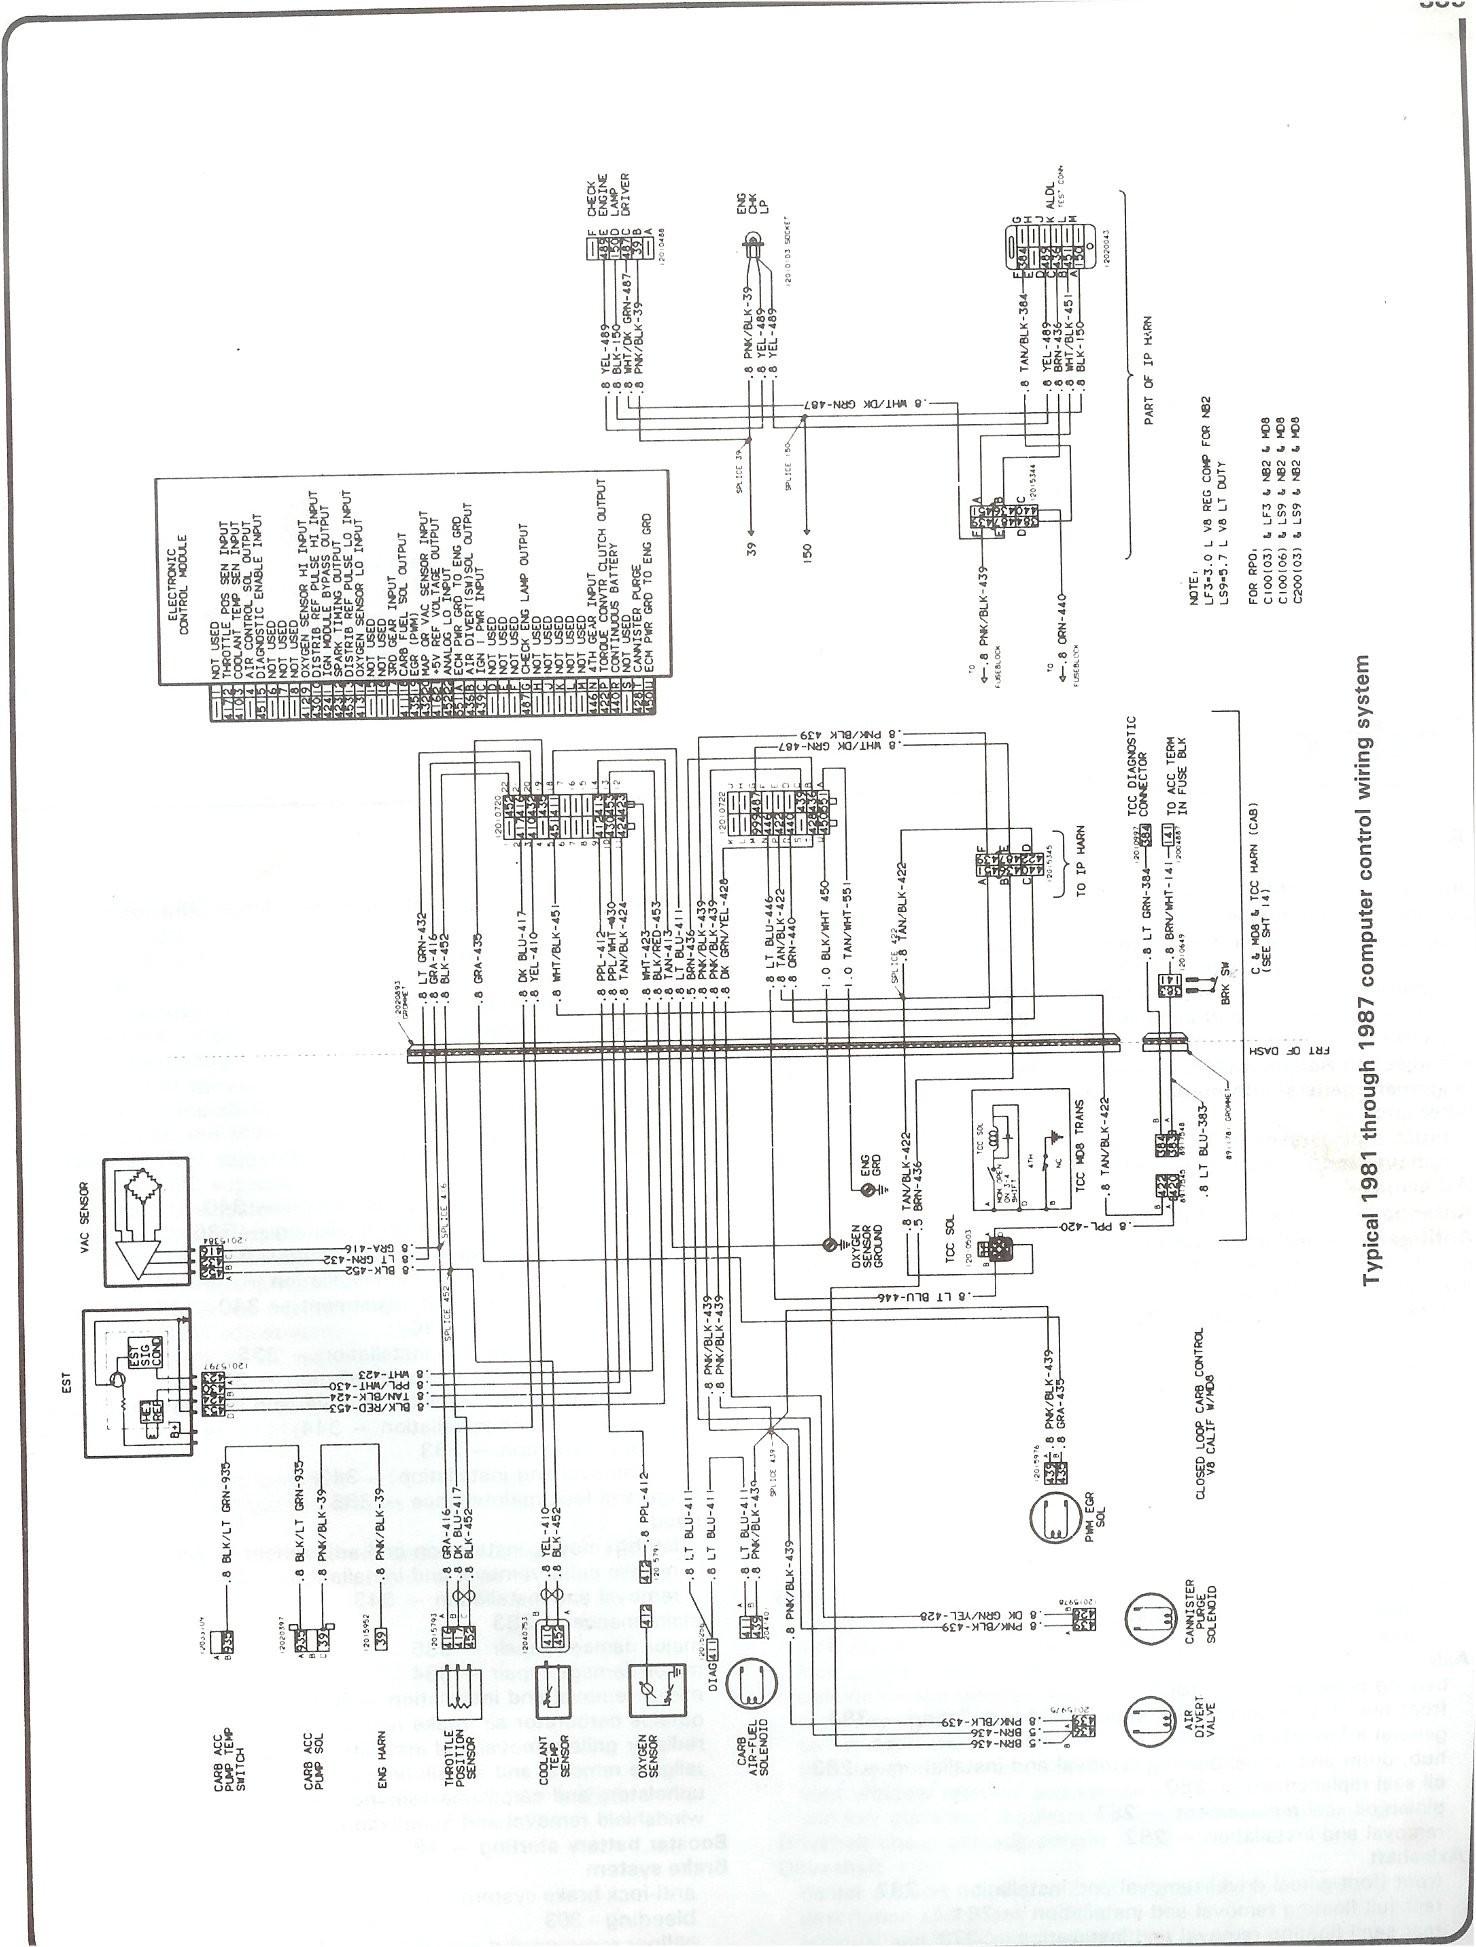 Fuel Pump Wiring Diagram 87 Jimmy Wiring Diagram Wiring Diagram Options Of Fuel Pump Wiring Diagram